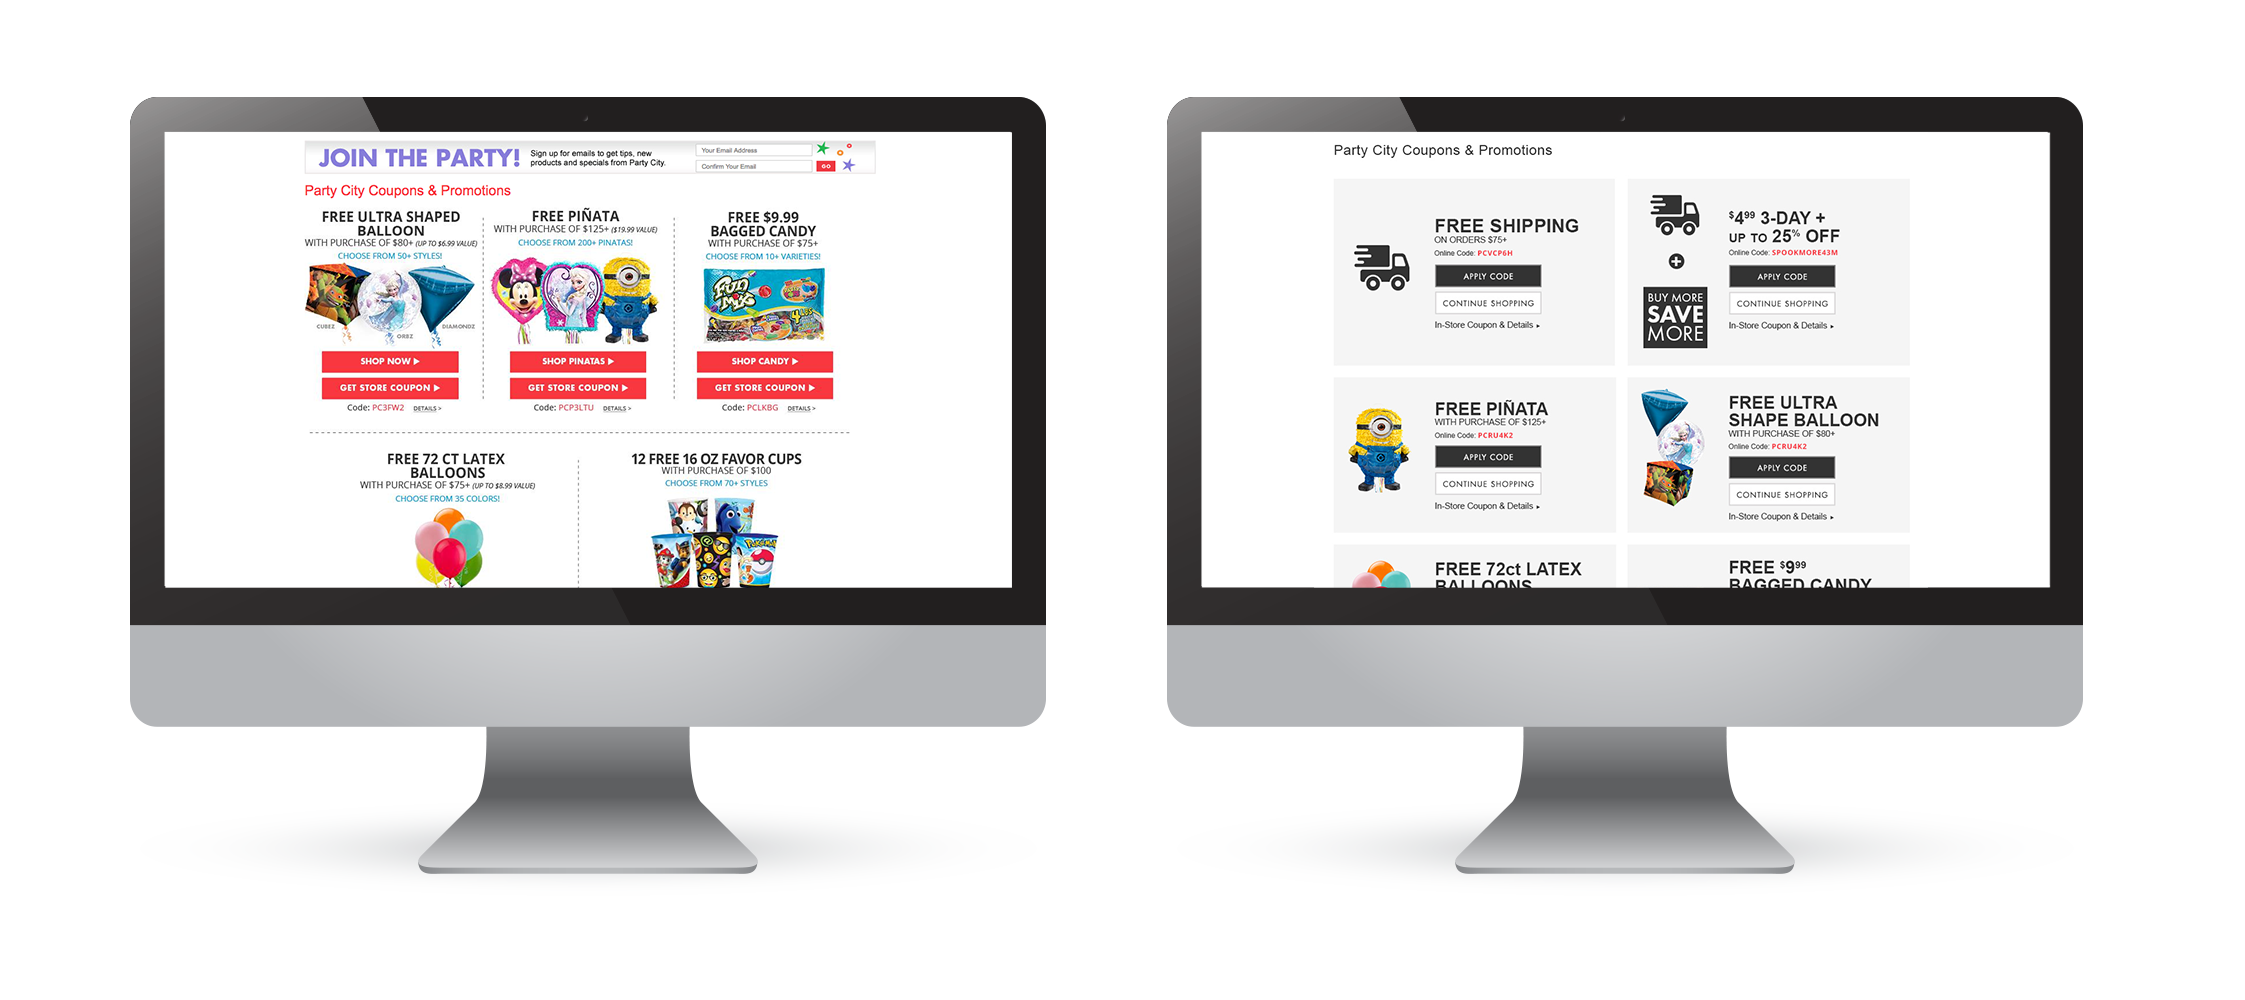 offers-before-after-desktop.png